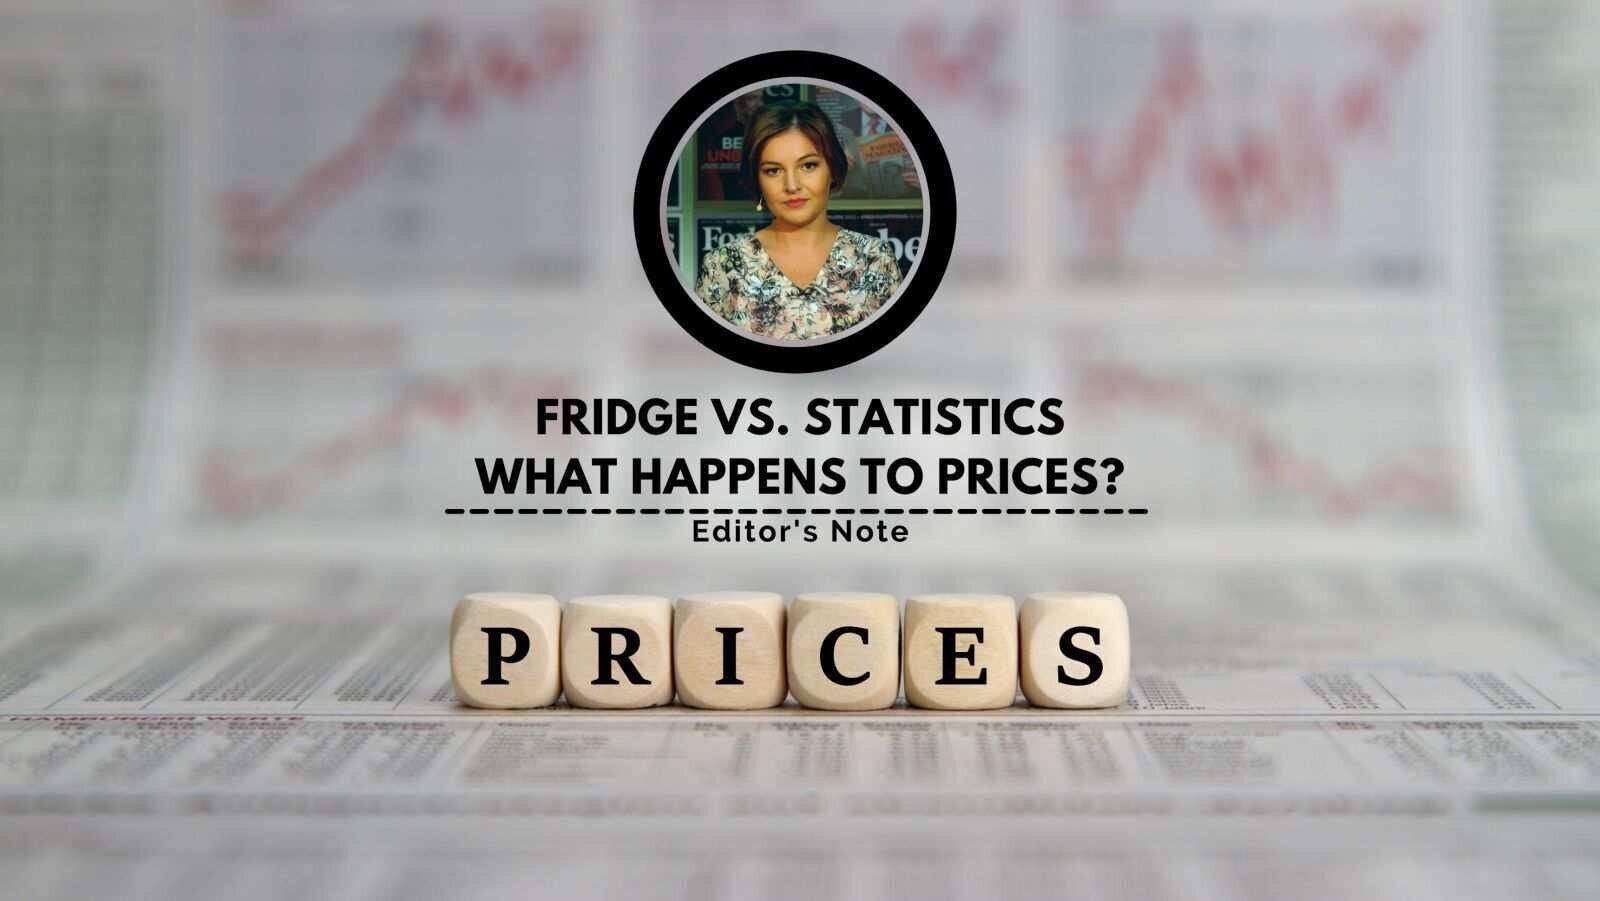 Fridge vs. Statistics: What Happens to Prices?